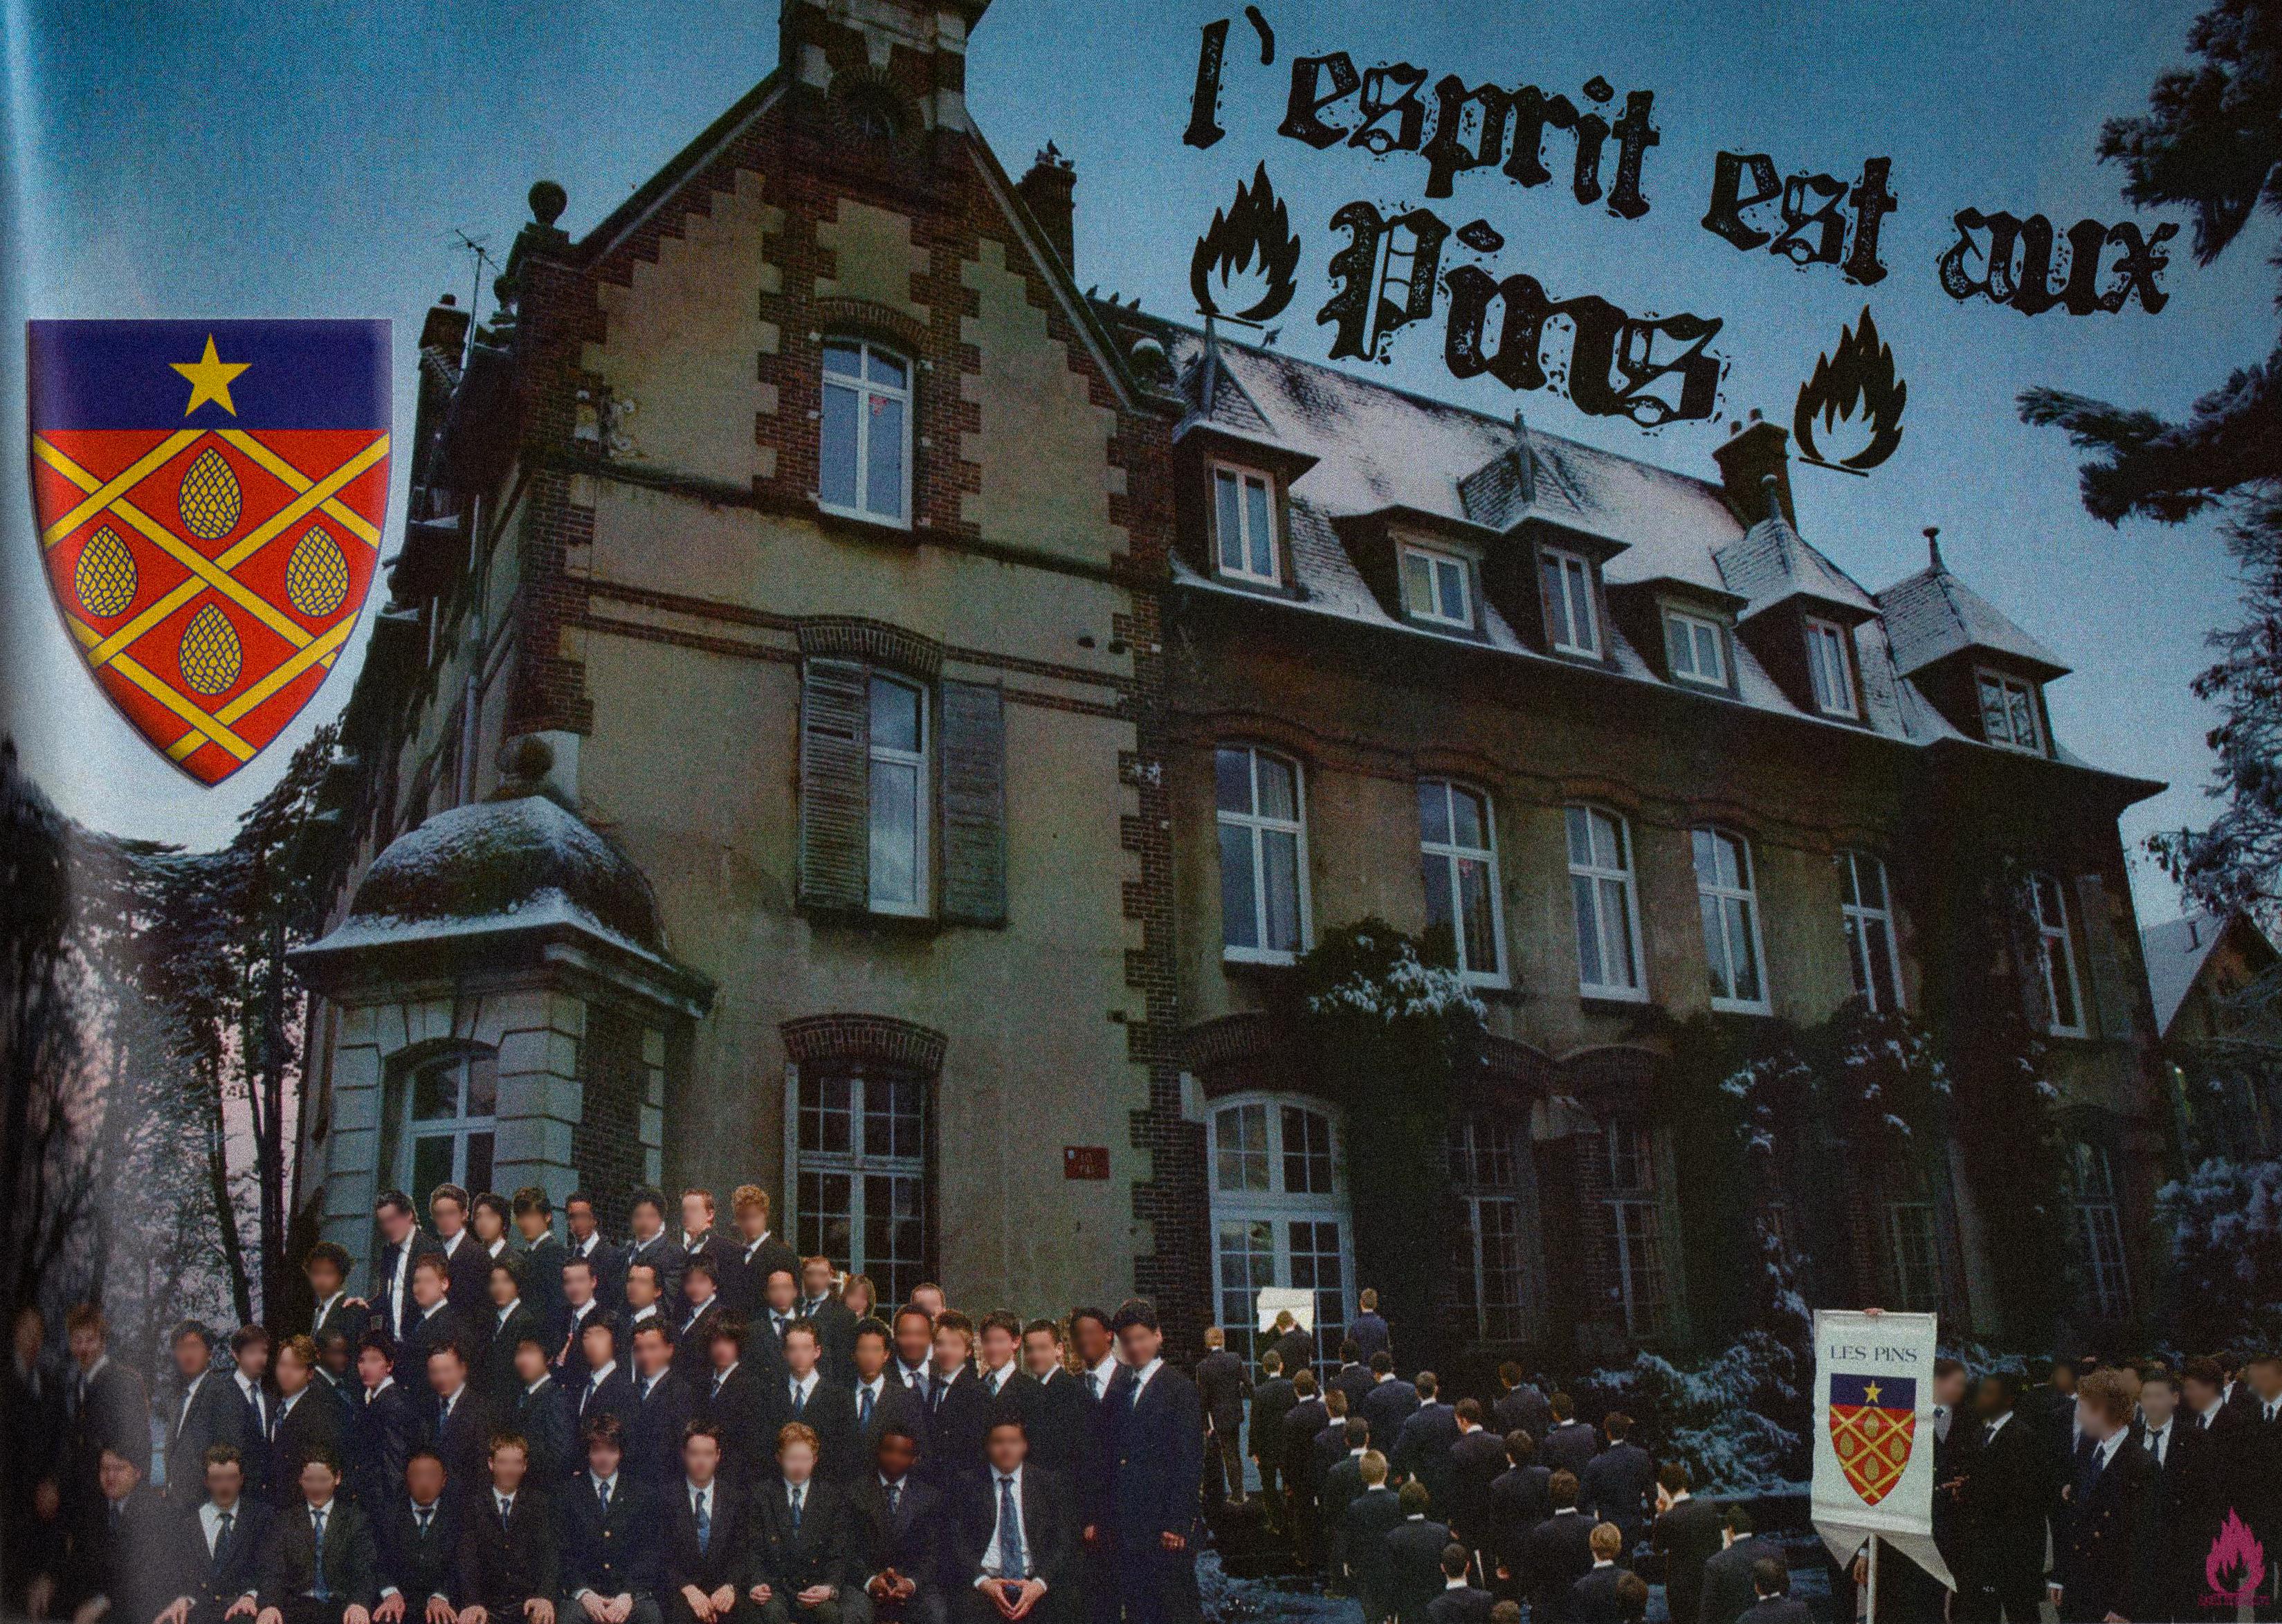 Foto bersama siswa sekolah École des Roches dengan spanduk bergambar lambang asrama Les Pins.